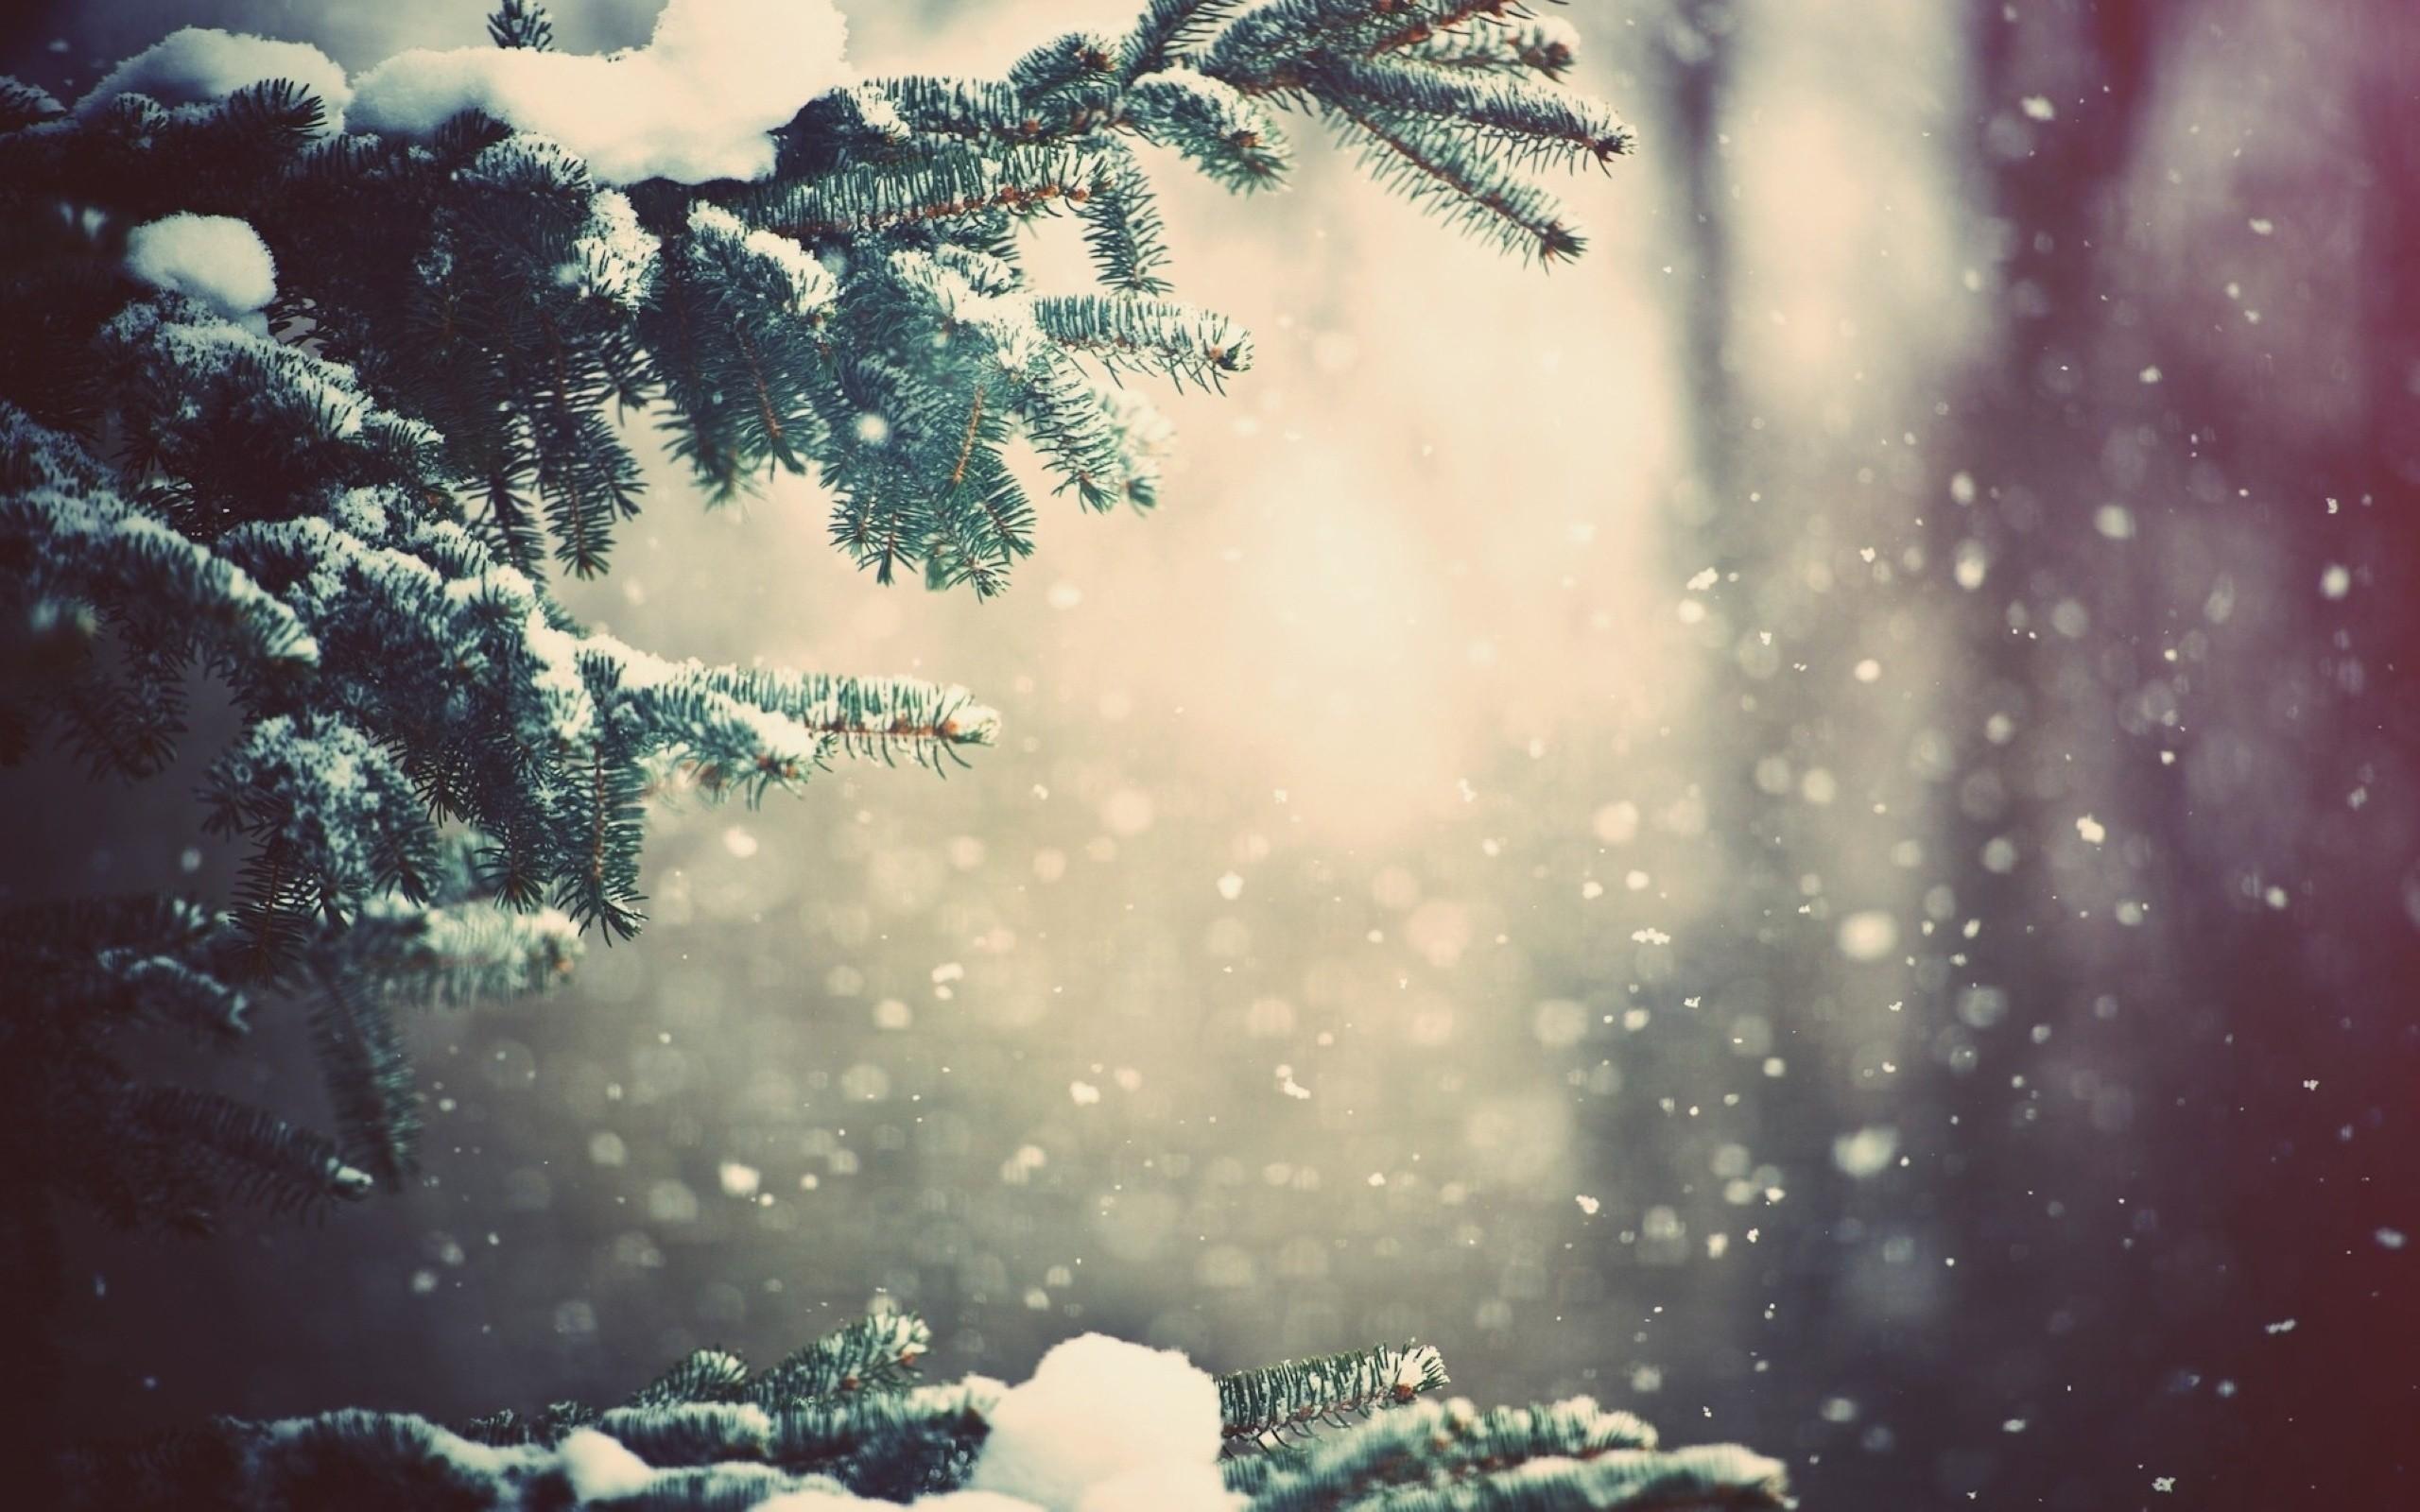 Snow on Christmas Tree Branches   Nexus Wallpaper 2560x1600